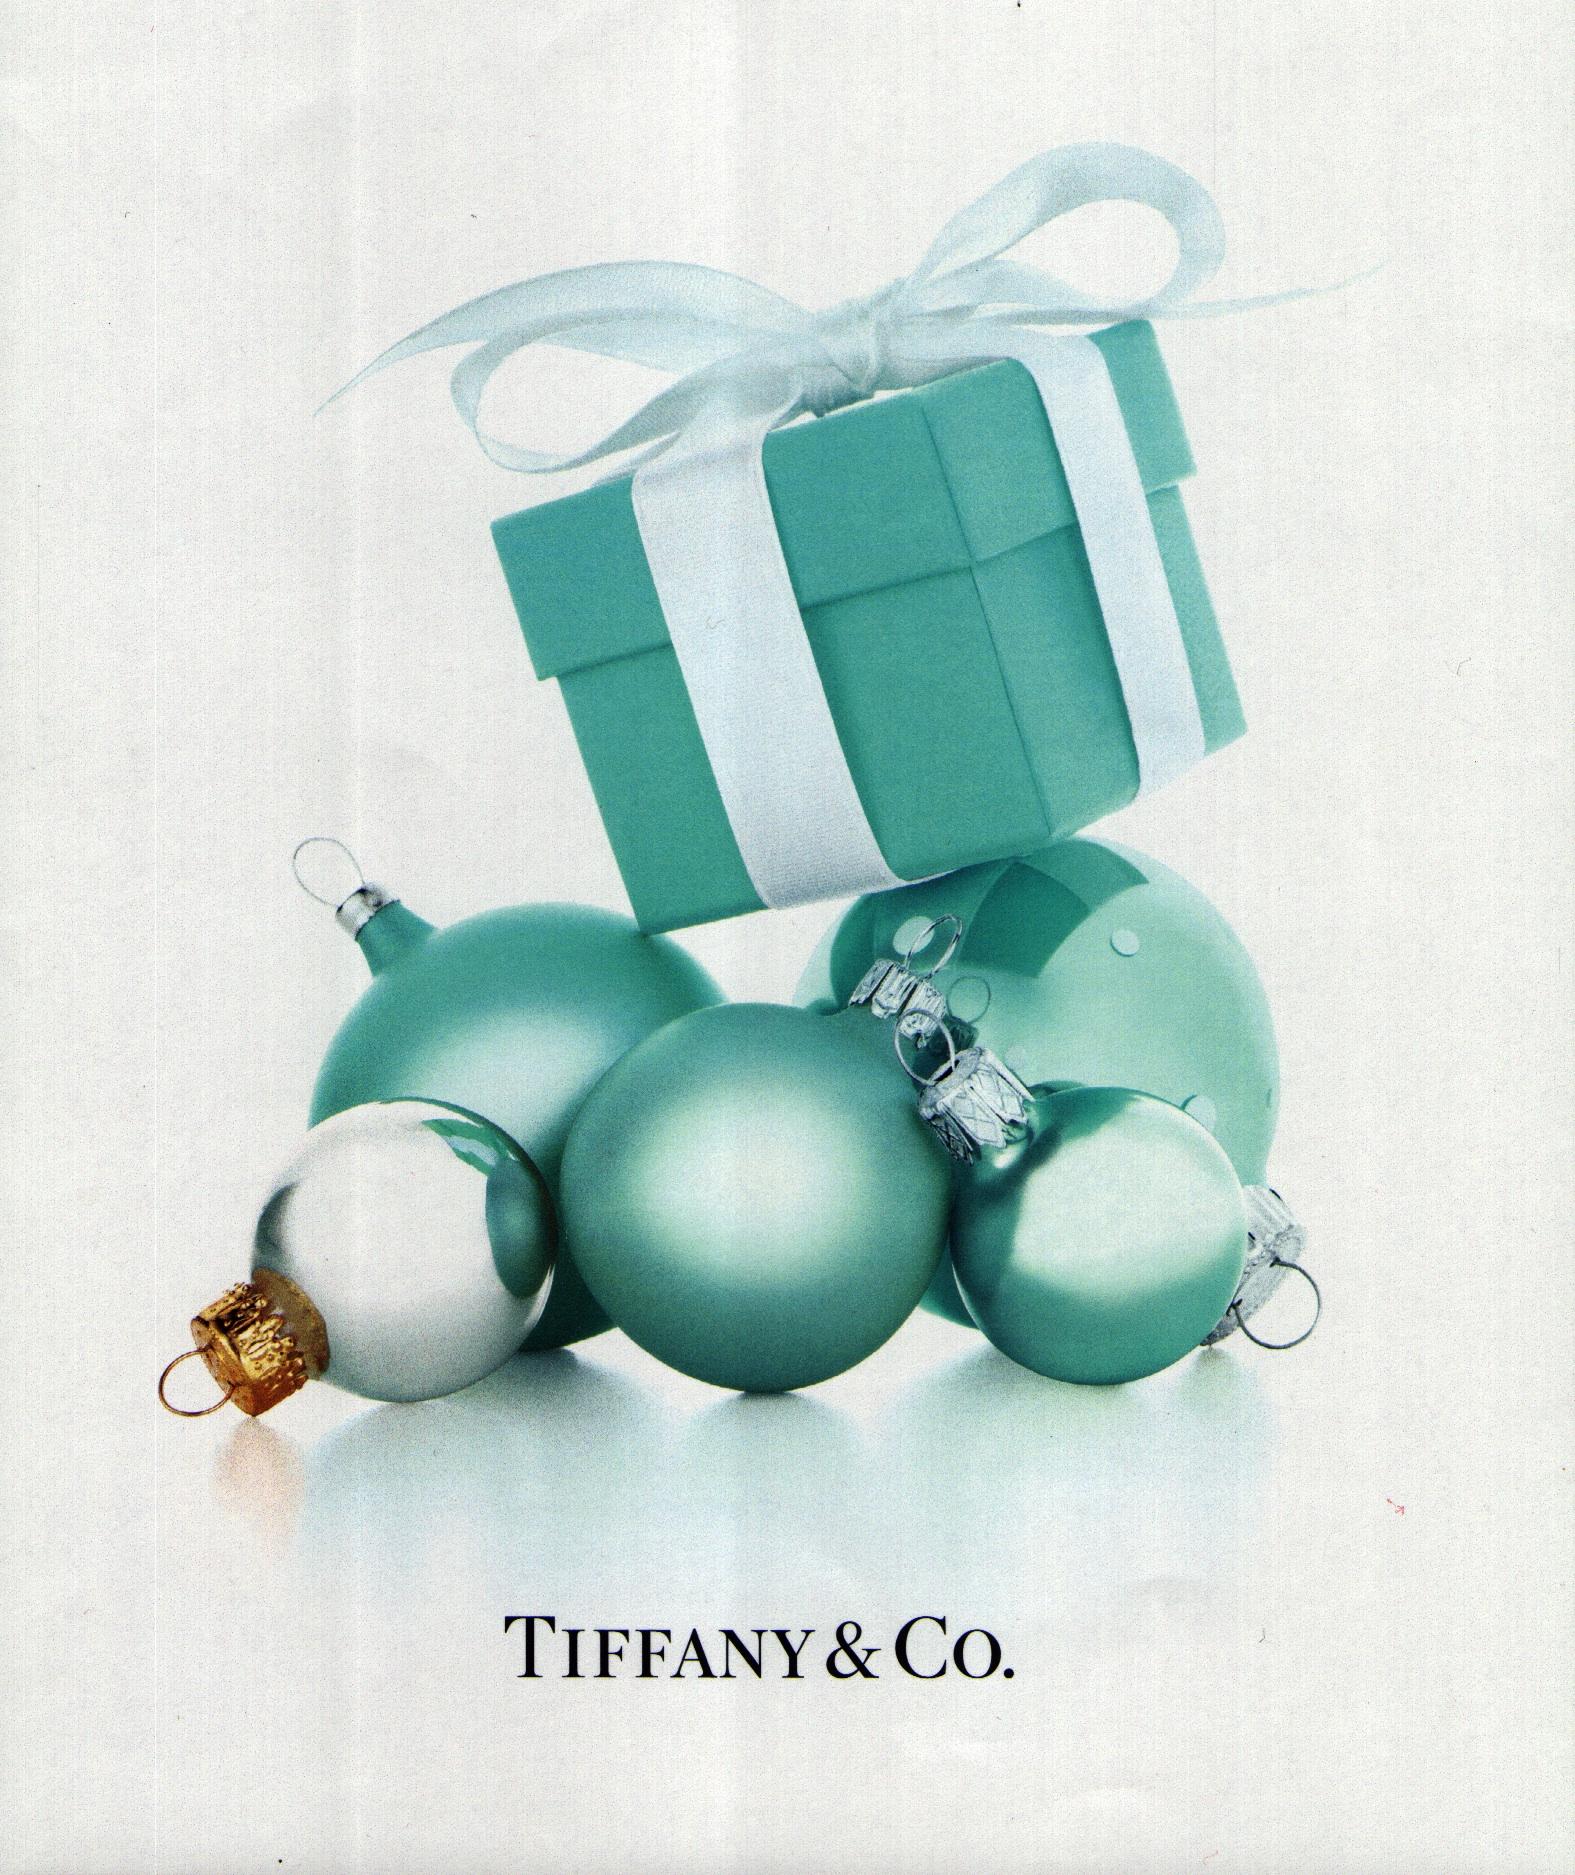 tiffany-advertisement